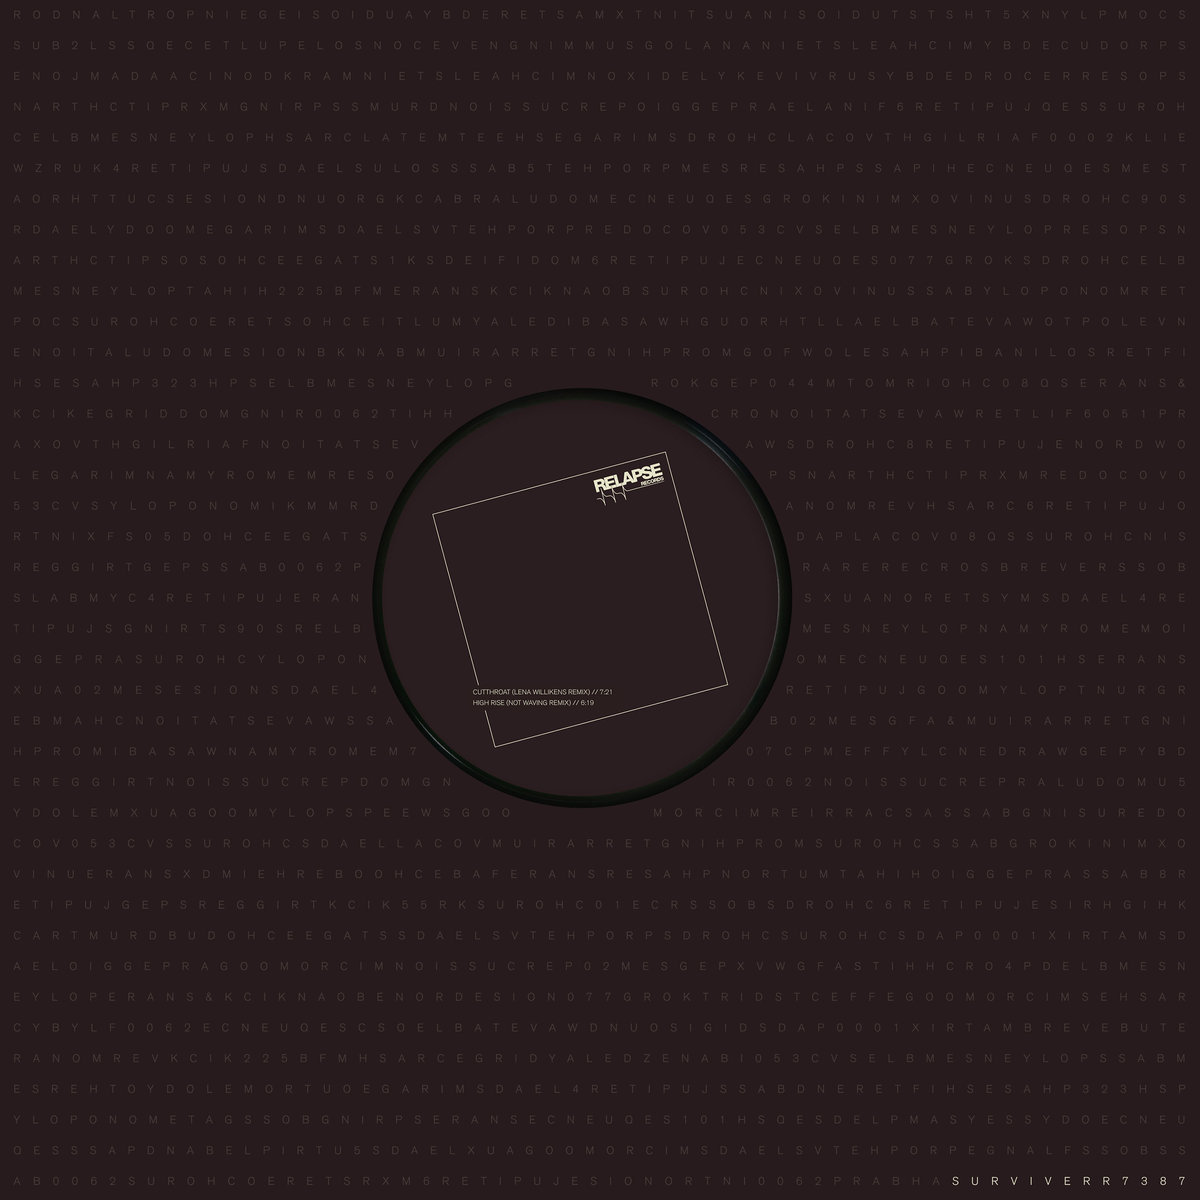 S U R V I V E | RR7387 EP